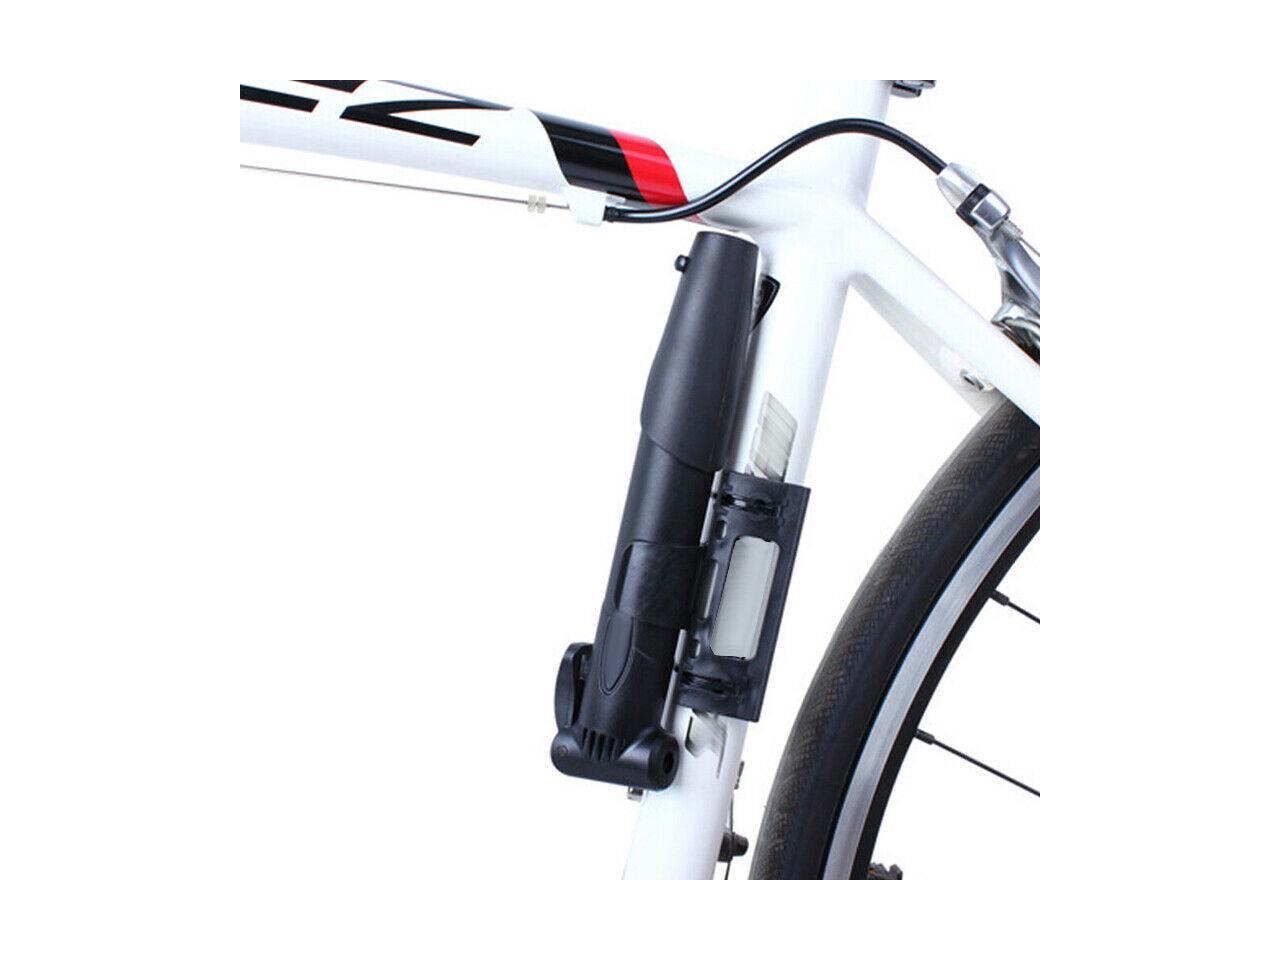 X AUTOHAUX Mini Bike Bicycle Tire Floor Pump Portable French American Type Valve Inflator Blue for Road Bike Mountain Bike